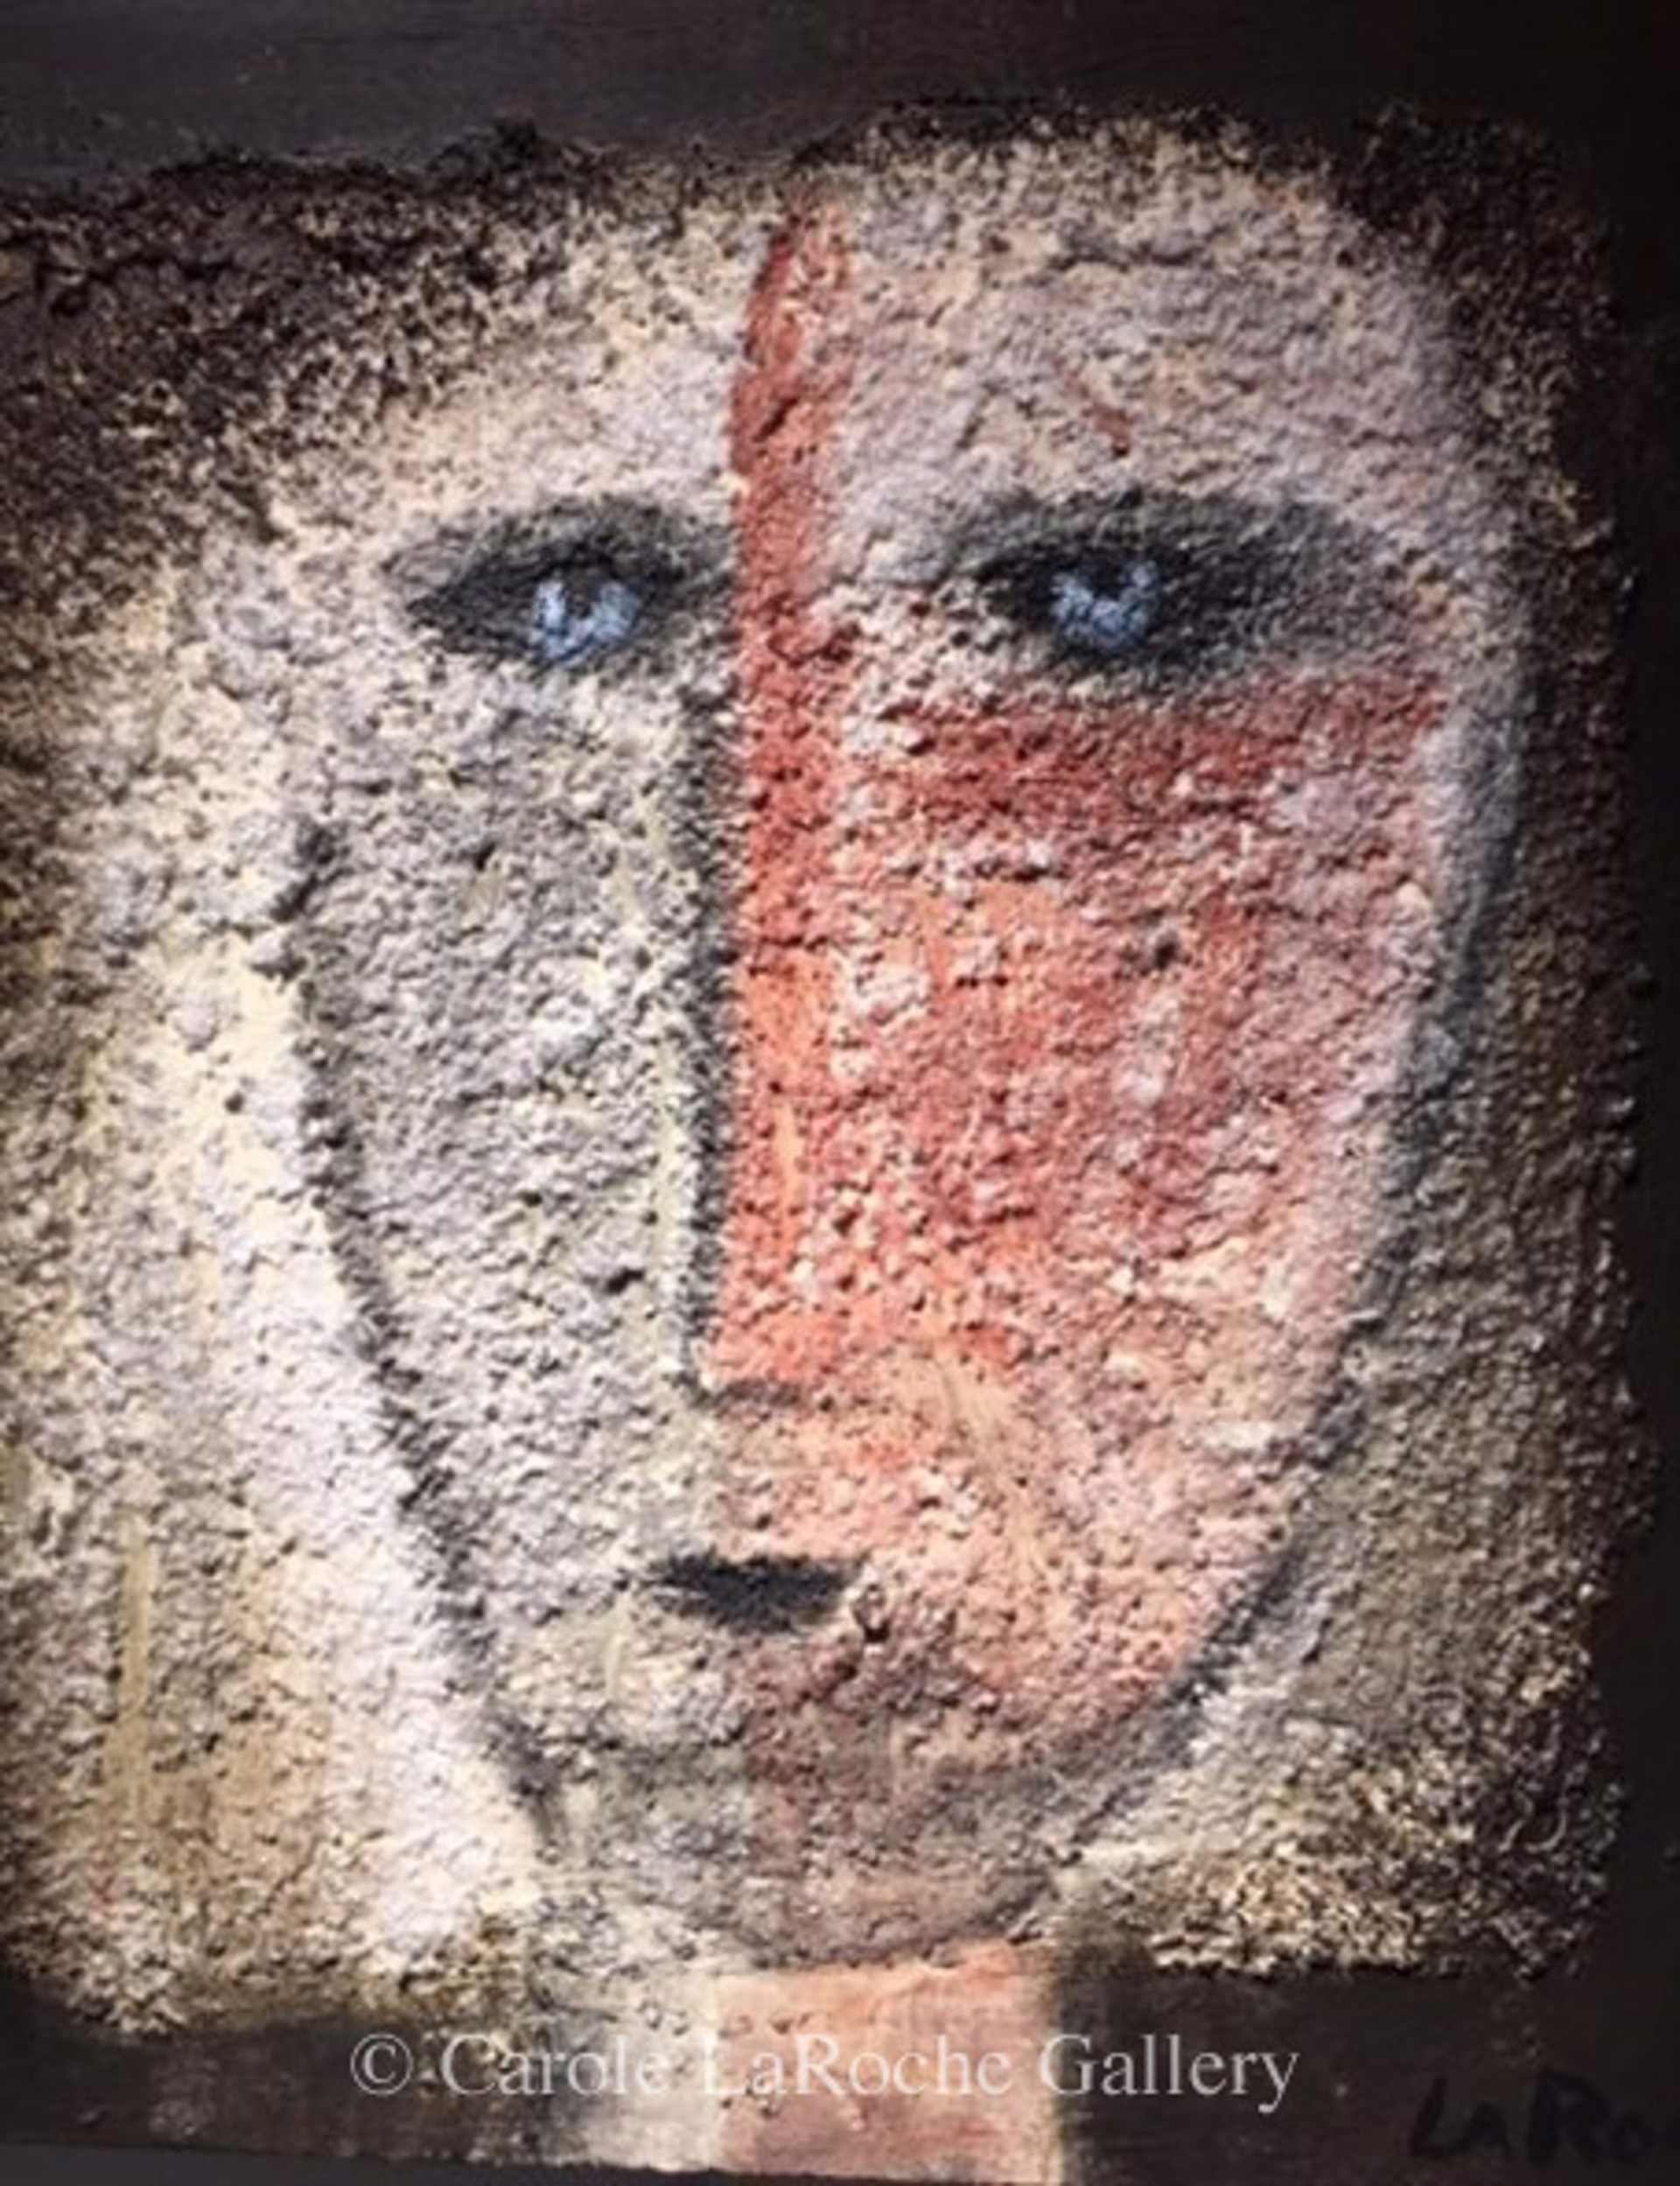 YOUNG SHAMAN by Carole LaRoche